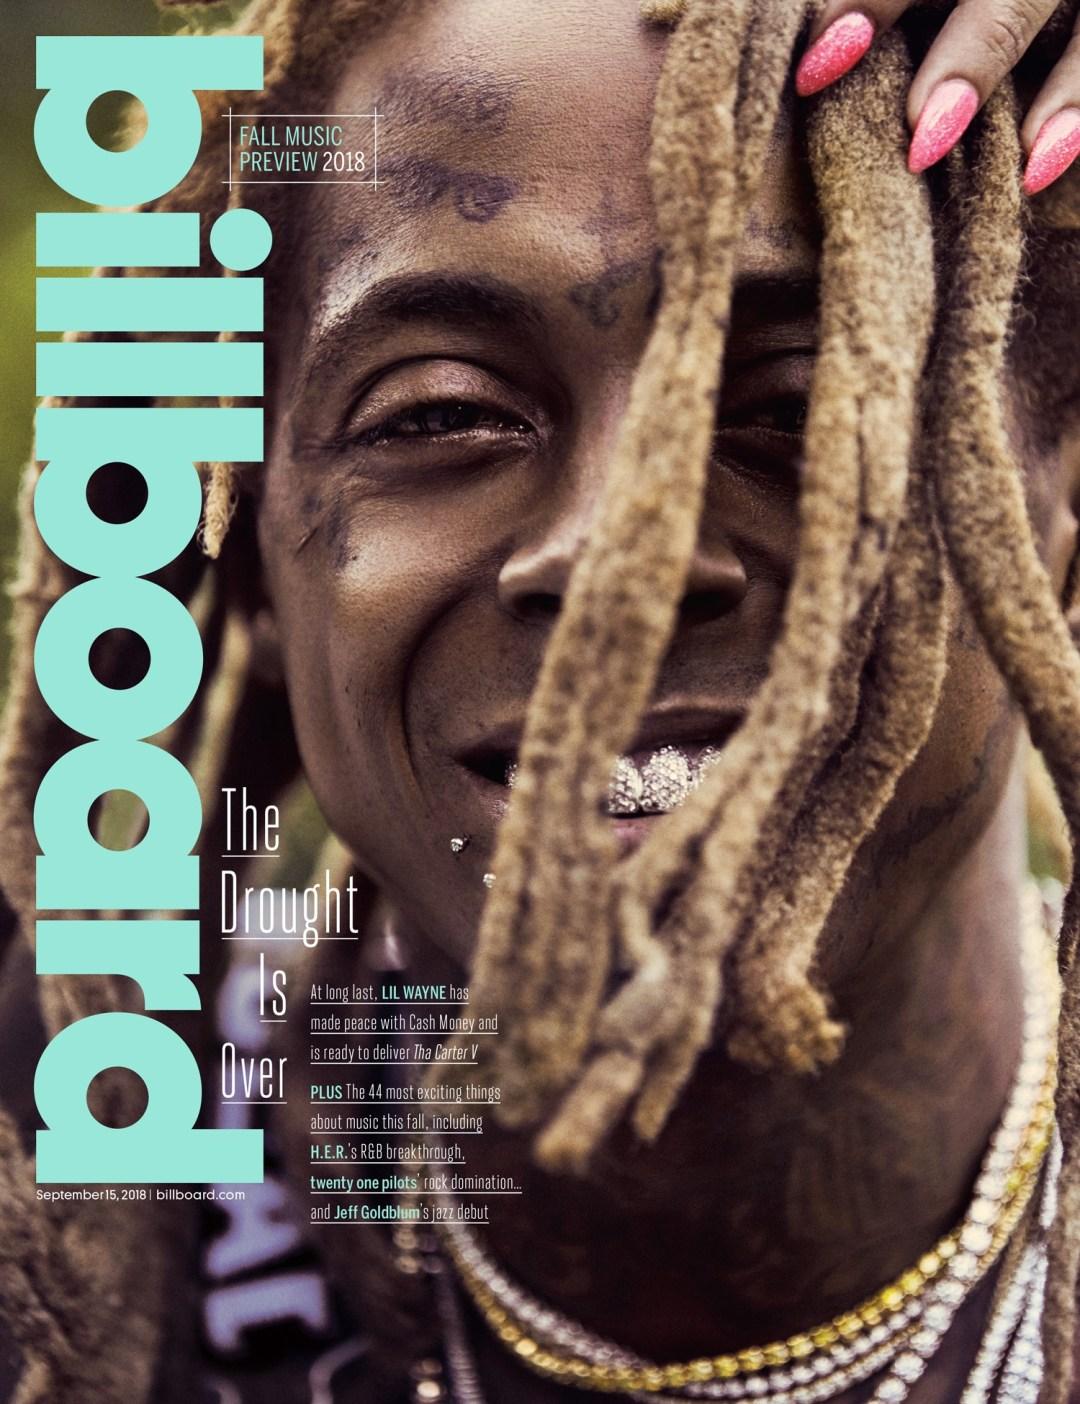 Rapper, Lil Wayne declares Nicki Minaj the 'Queen of Hip-Hop'